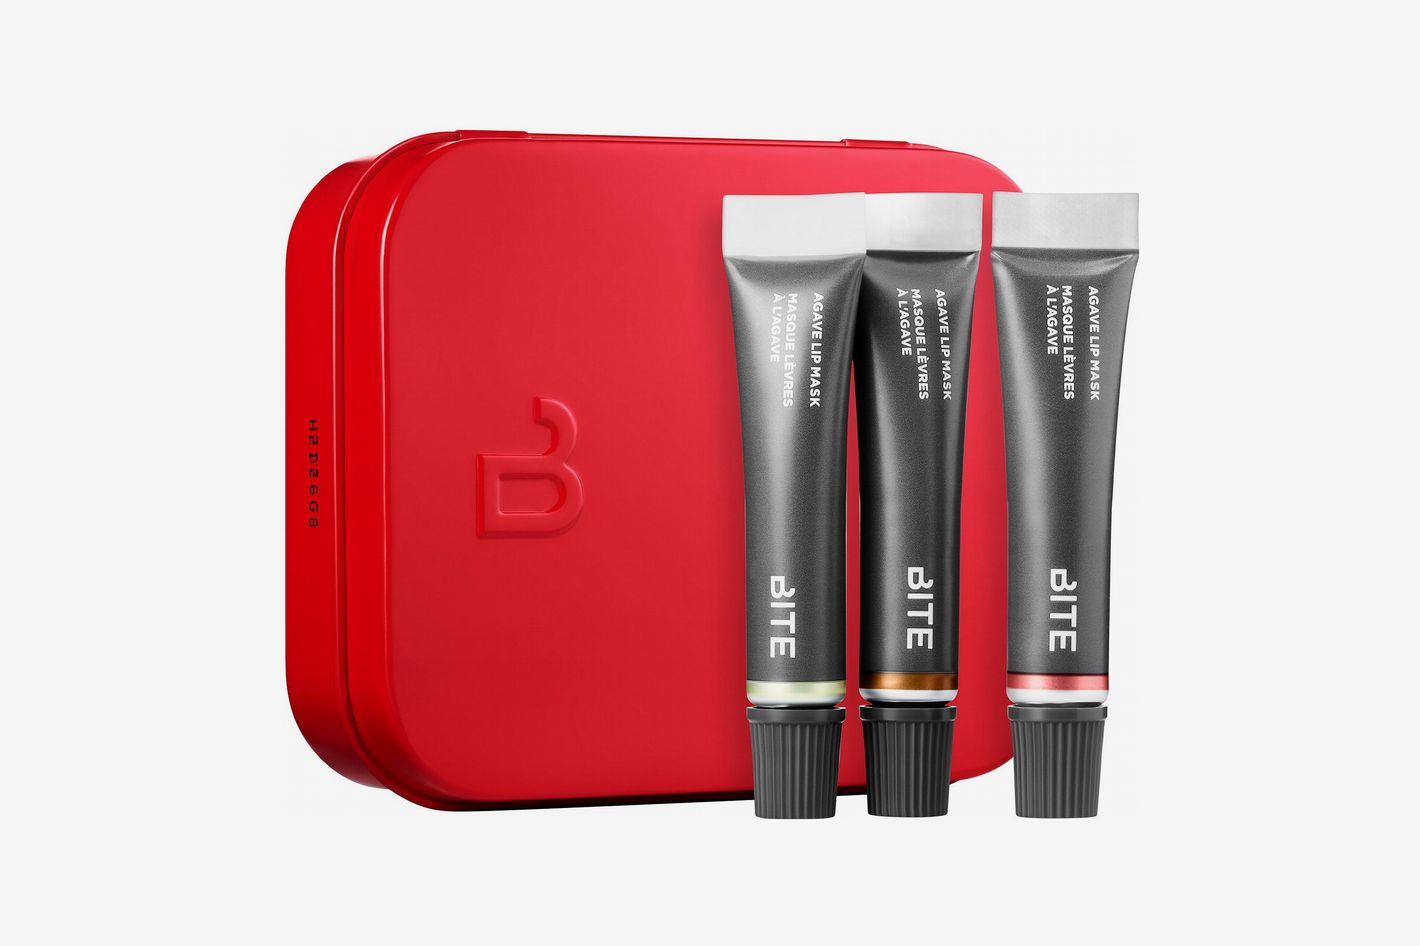 Bite Beauty Agave Treat Trio Mini Agave Lip Mask Set